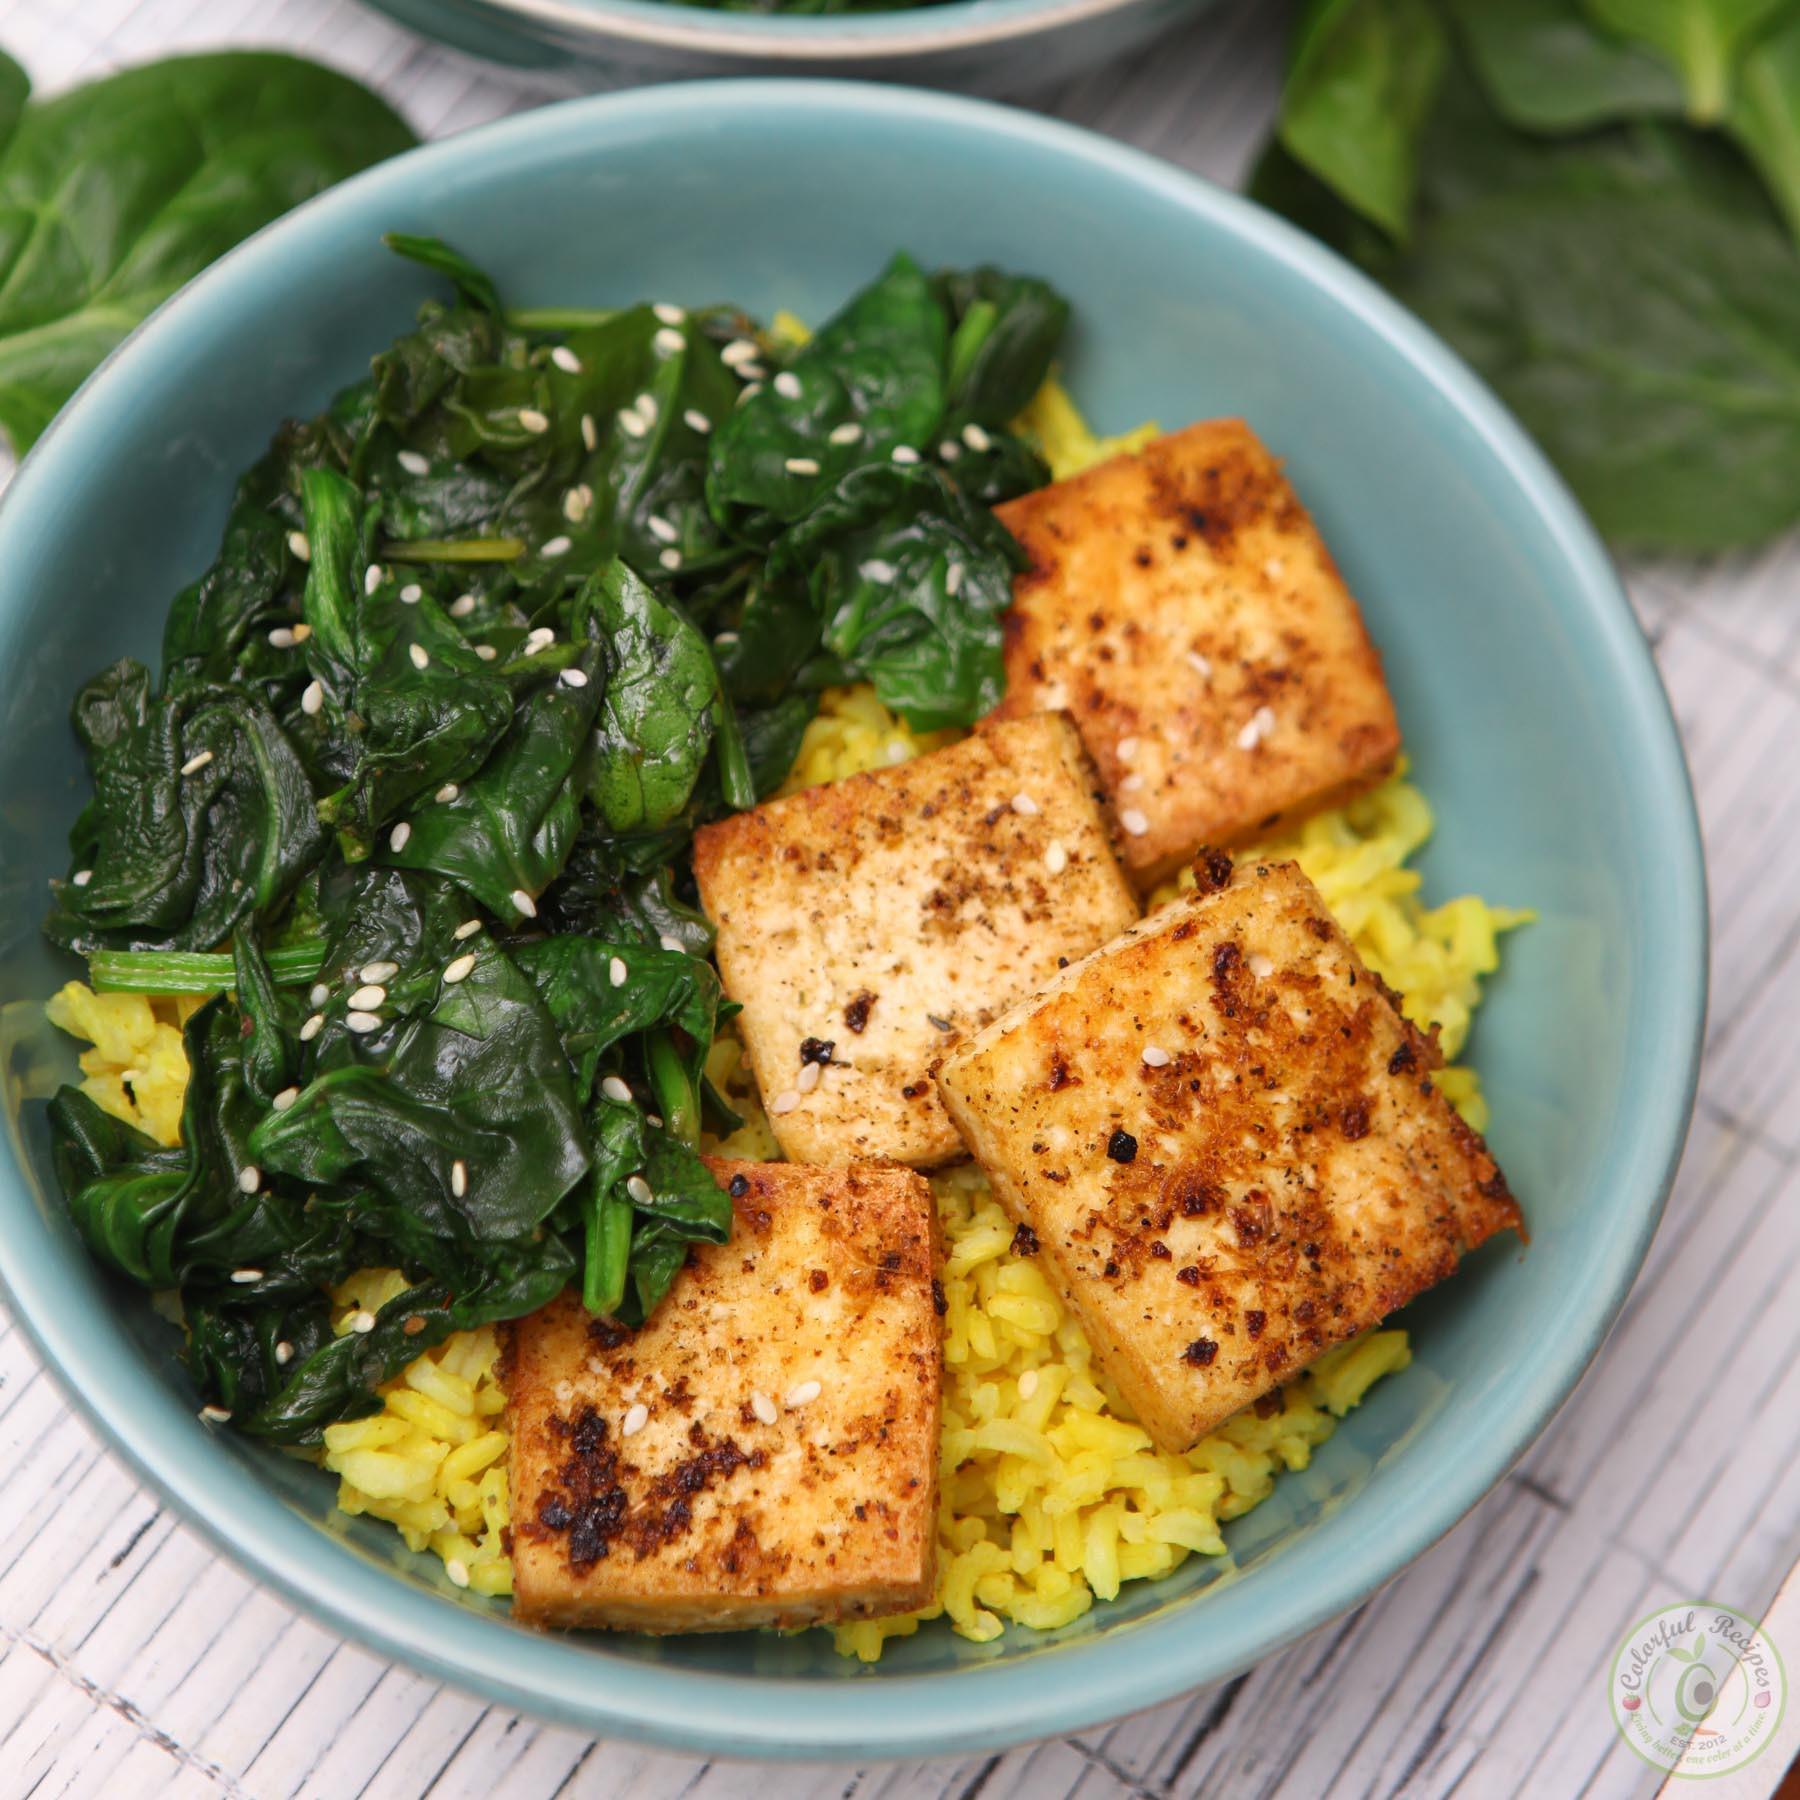 Simple Tofu Recipes  Simple Spinach Tofu With Turmeric Rice Colorful Recipes